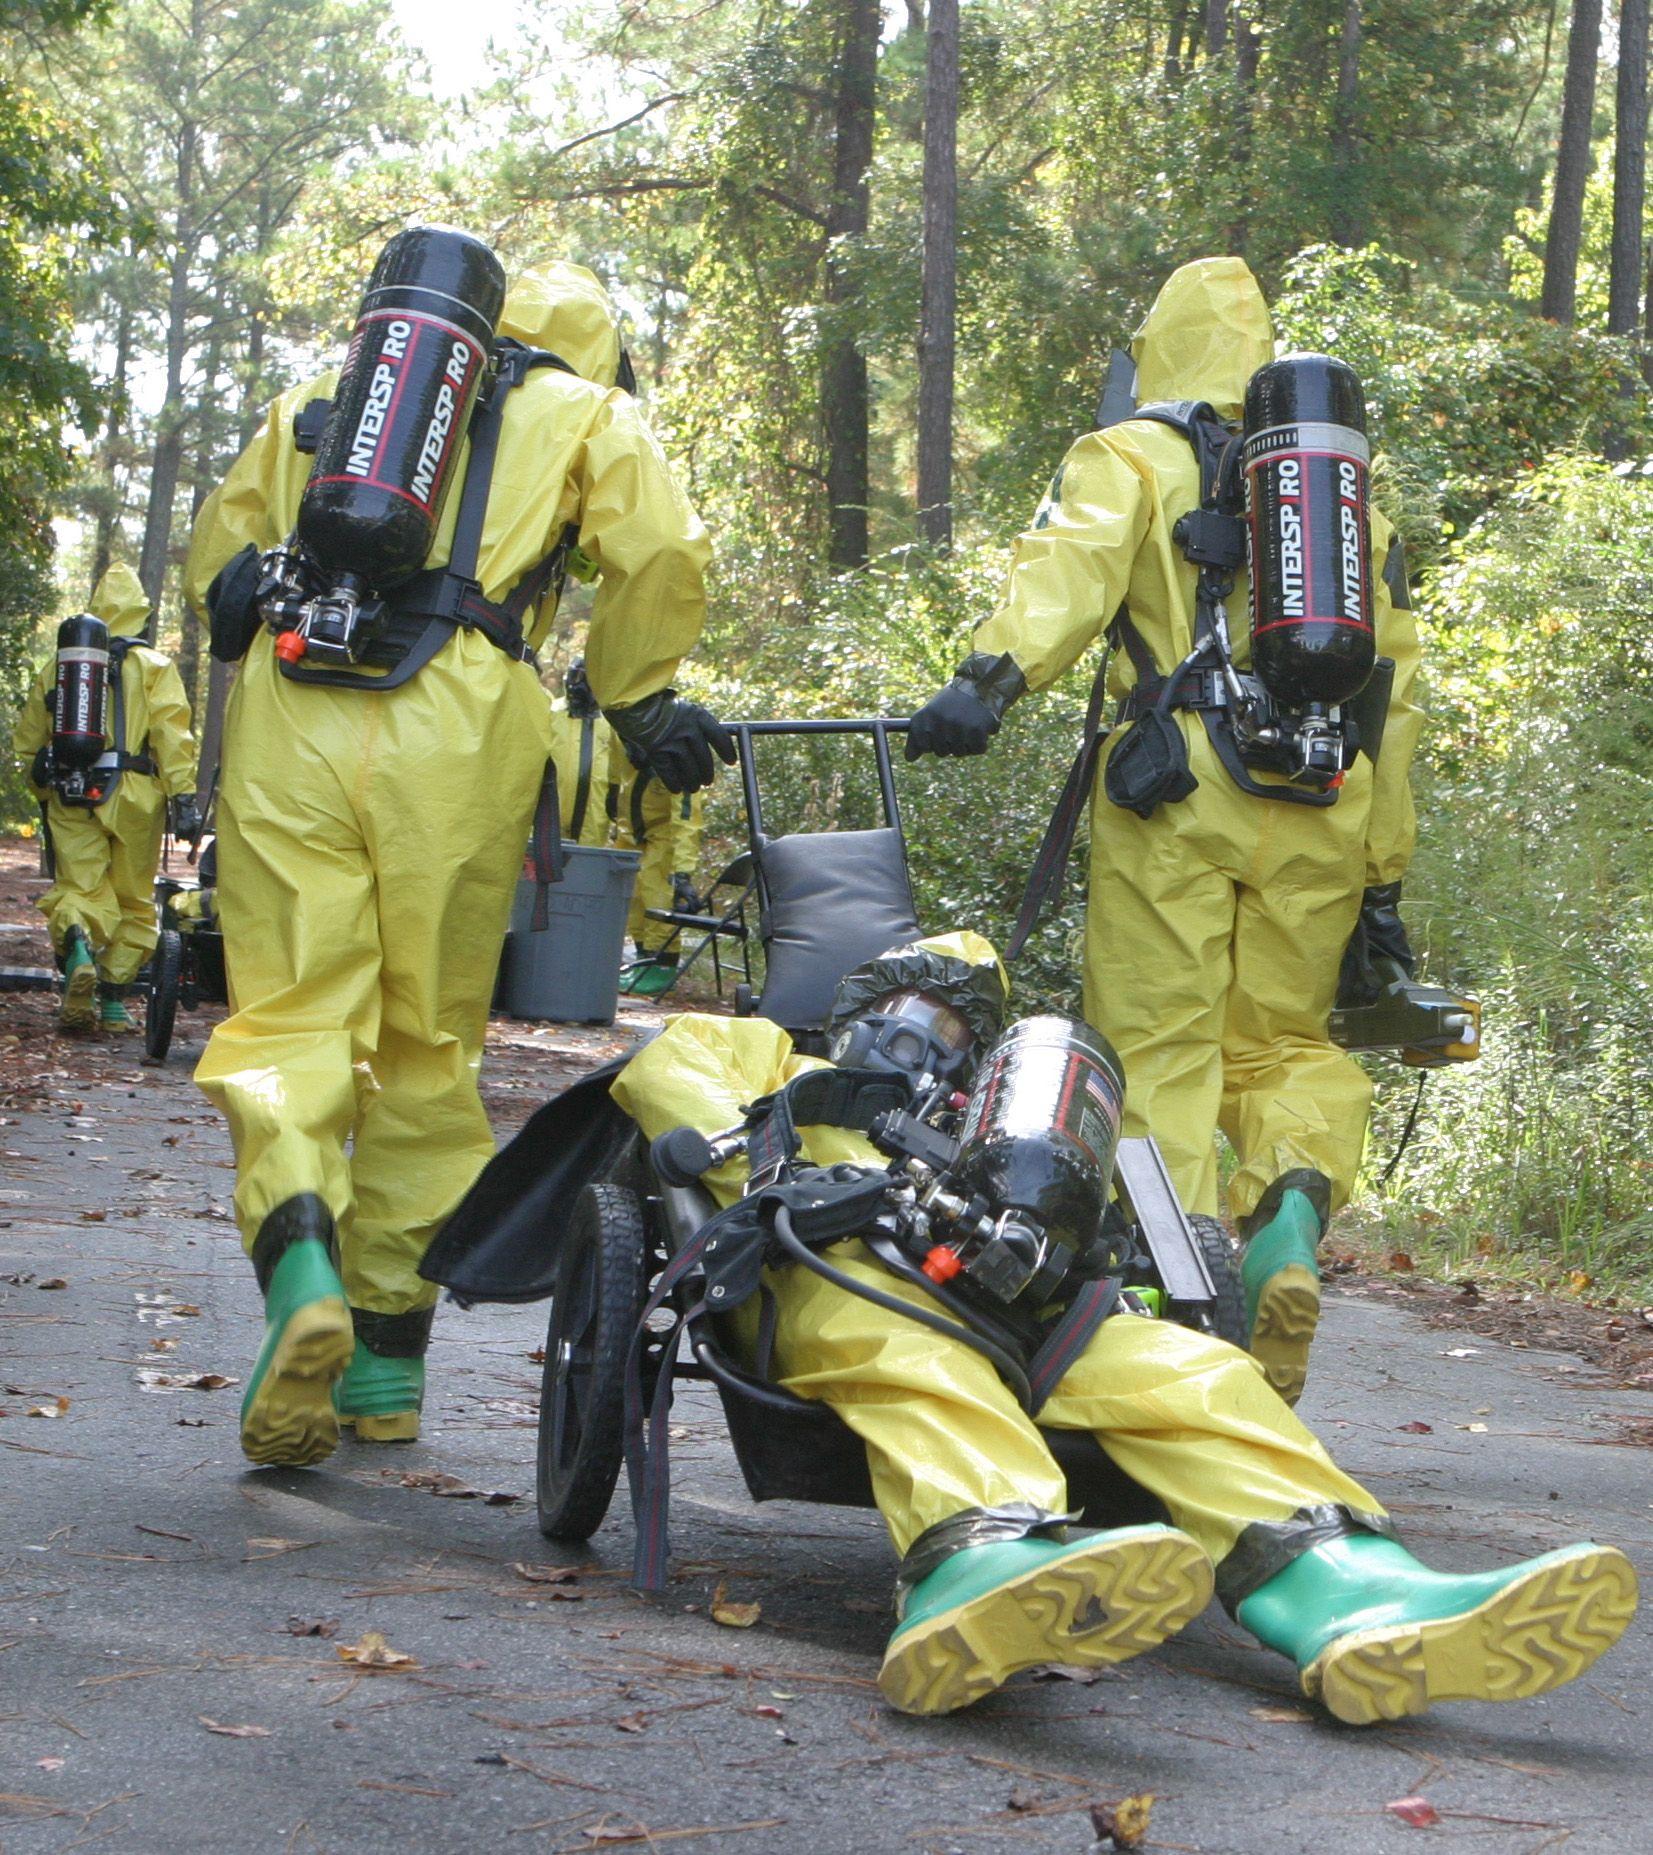 Resultado de imagen de firefighters training cbrn suit | Fire